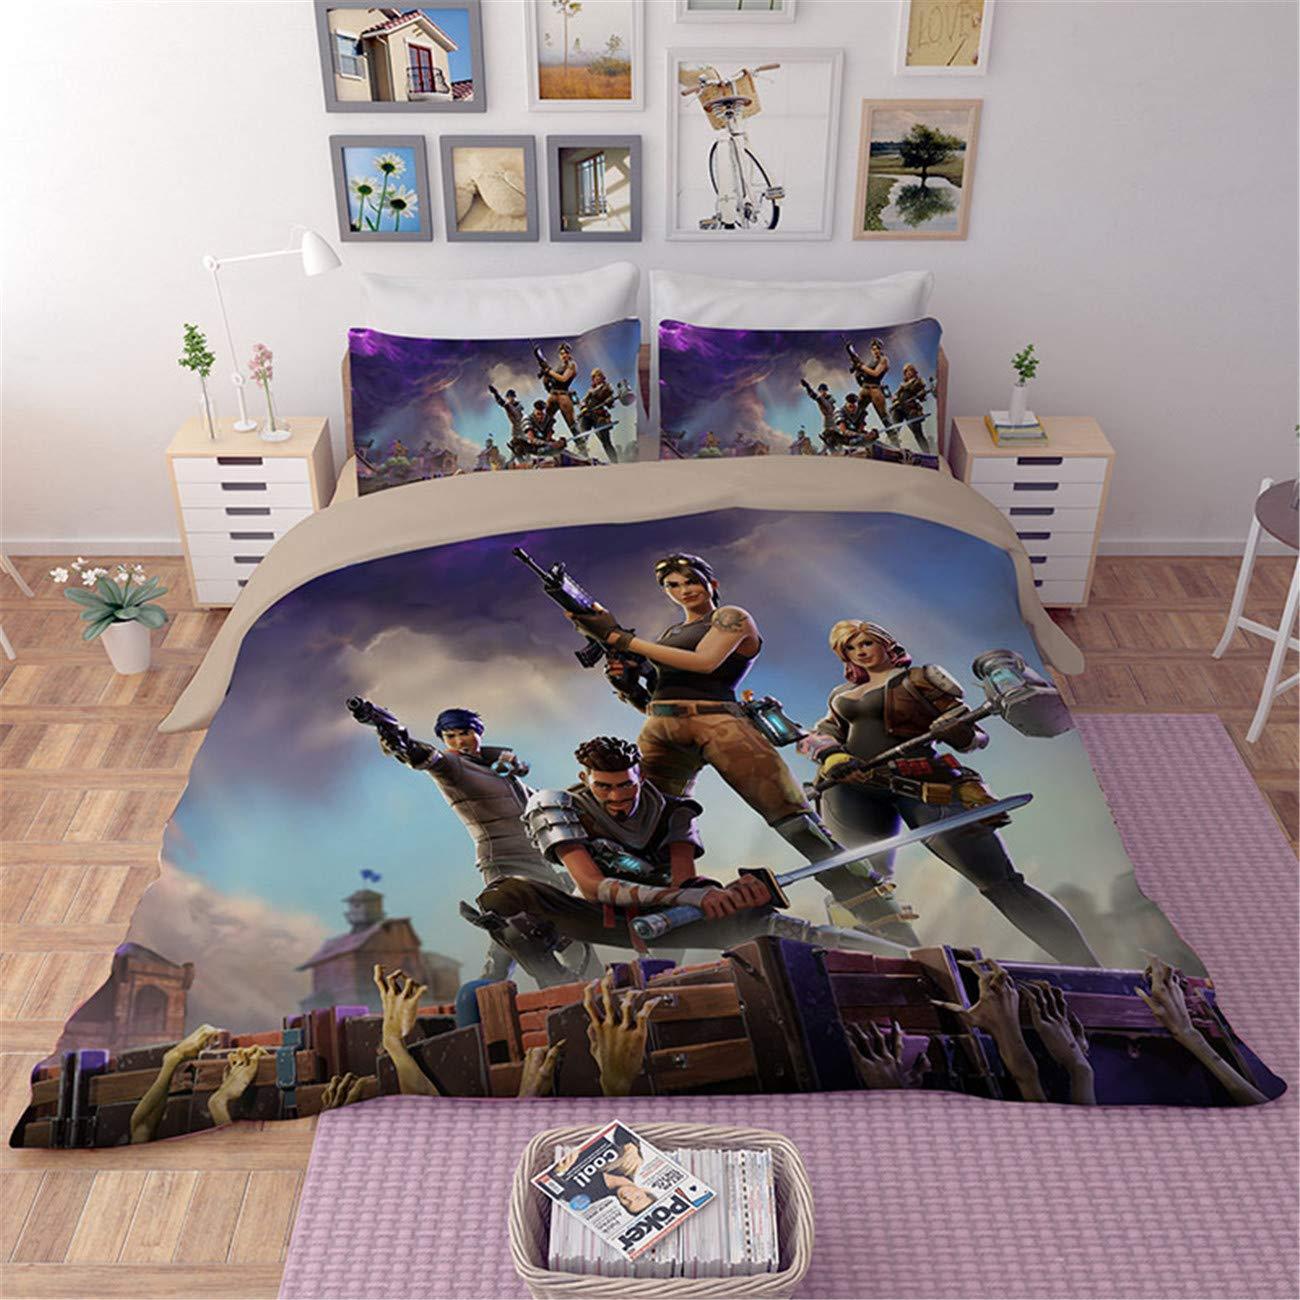 Fairy Kaari 3D Fortnite Duvet Cover Set Kids Teens Adults Best Gift for Beloved Cartoon Bedding 3-Piece 100/% Microfiber Bed Set 1Duvet Cover.2Pillow Shames Twin Full Queen King Size